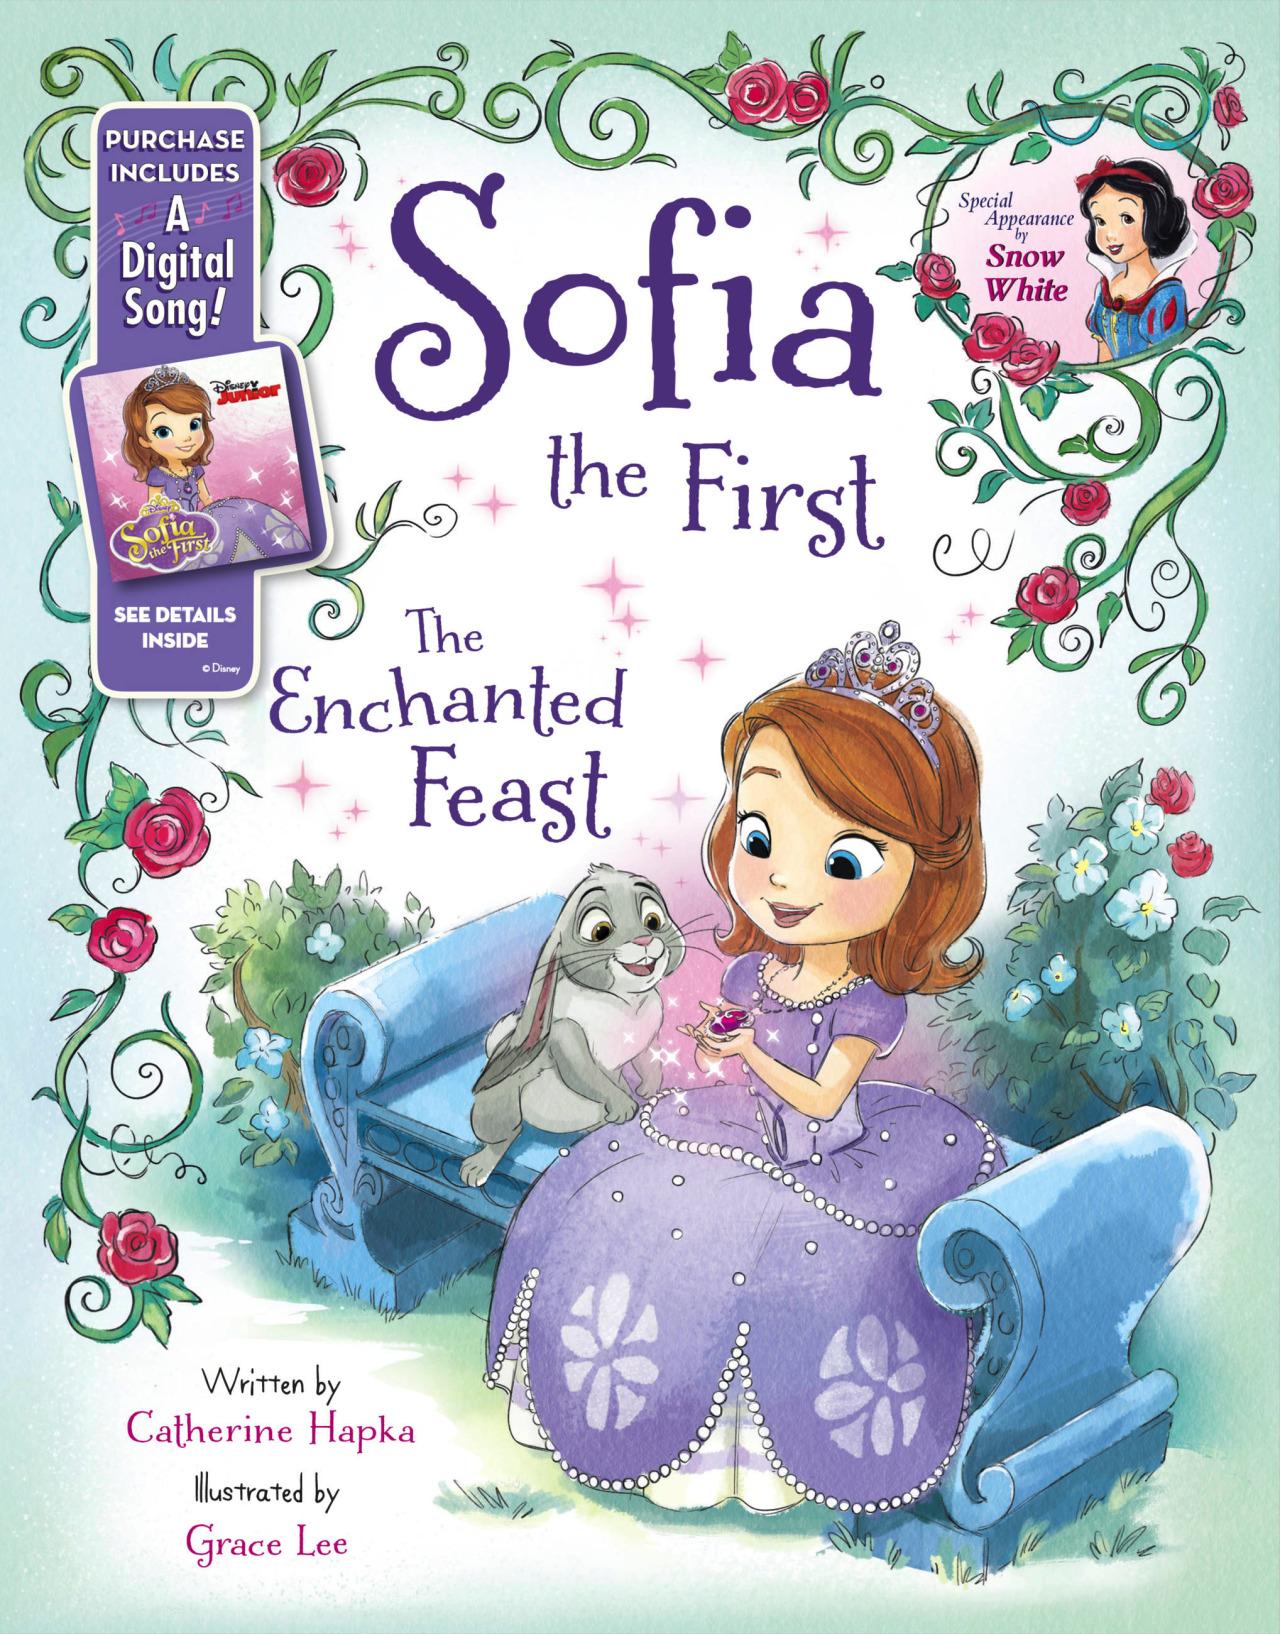 The Enchanted Feast Book Disney Wiki Fandom Powered By Wikia